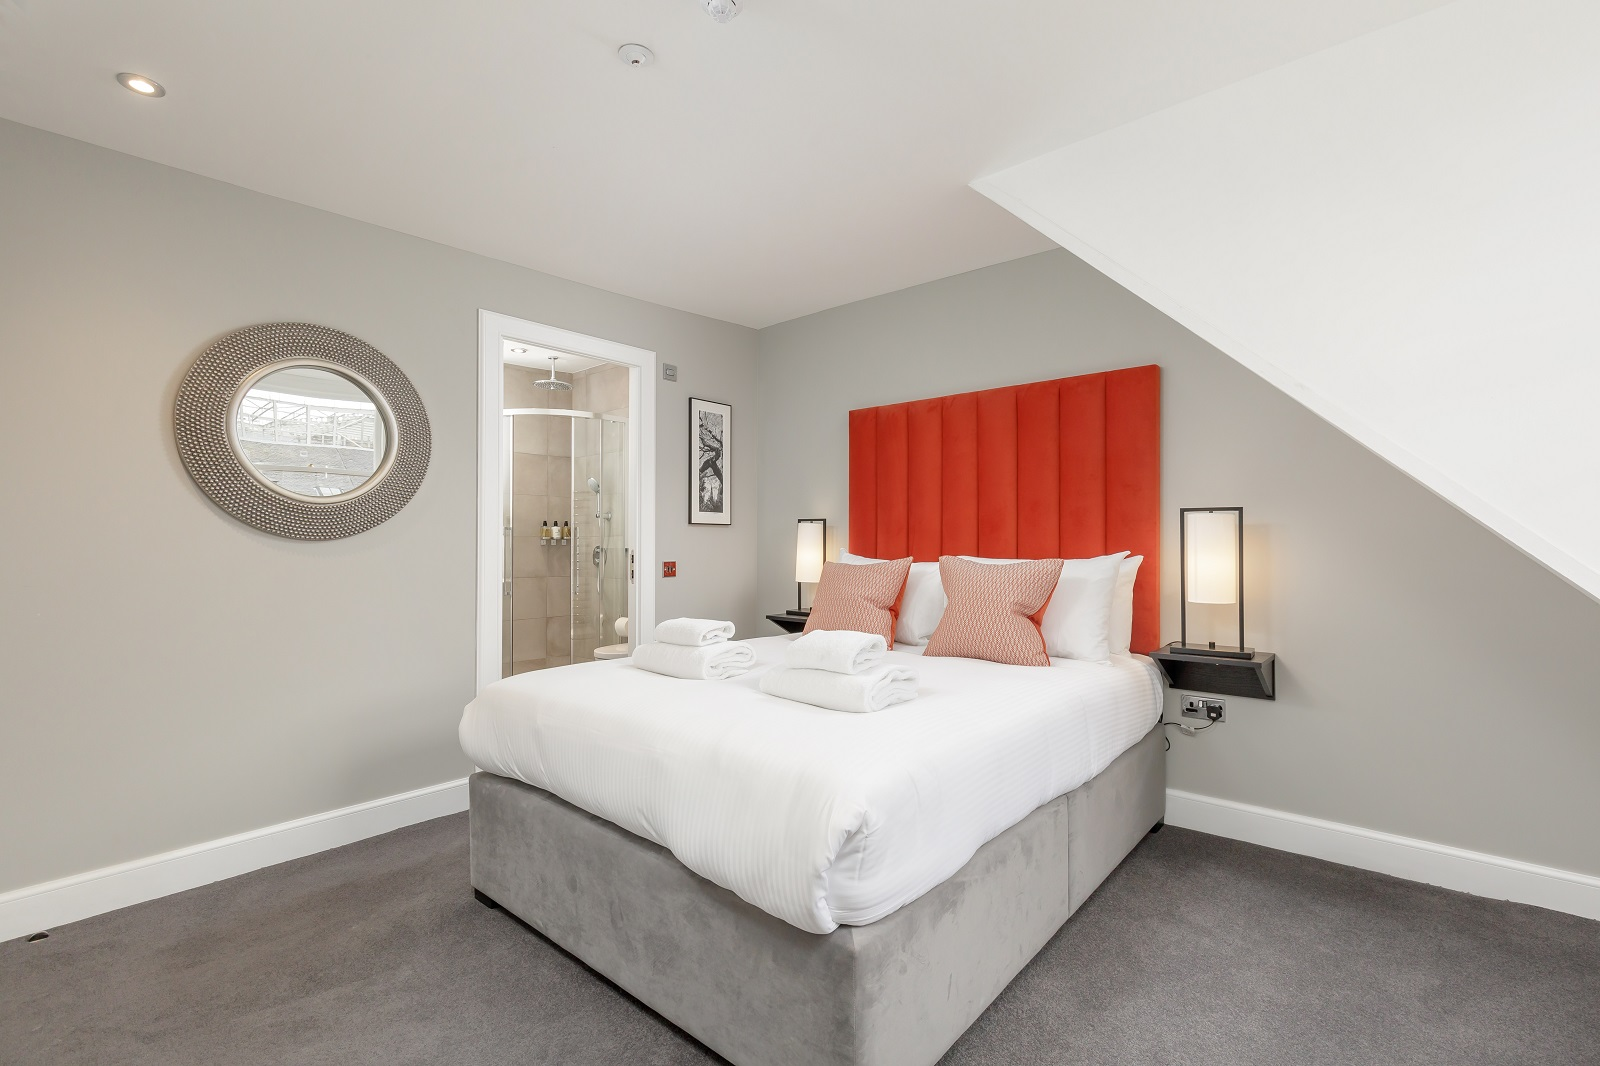 King size bed at Hanover Serviced Apartments - Citybase Apartments